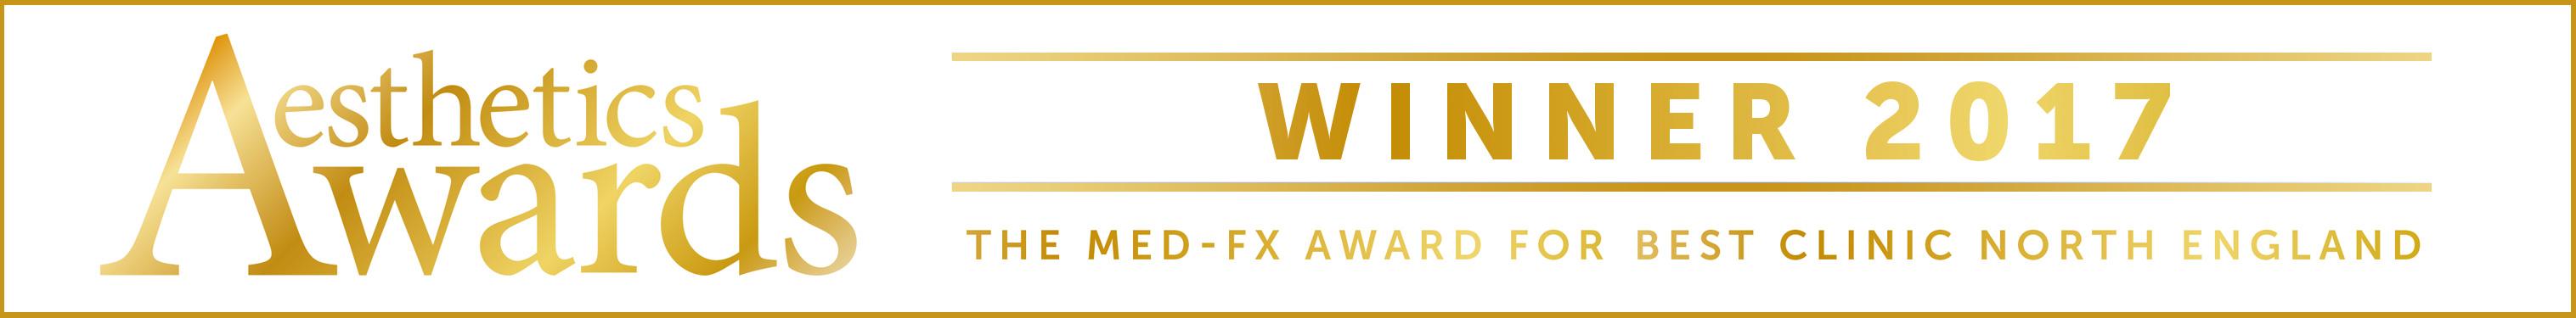 Aesthetics Awards Winner 2017 - Med-FX Best Clinic North of England